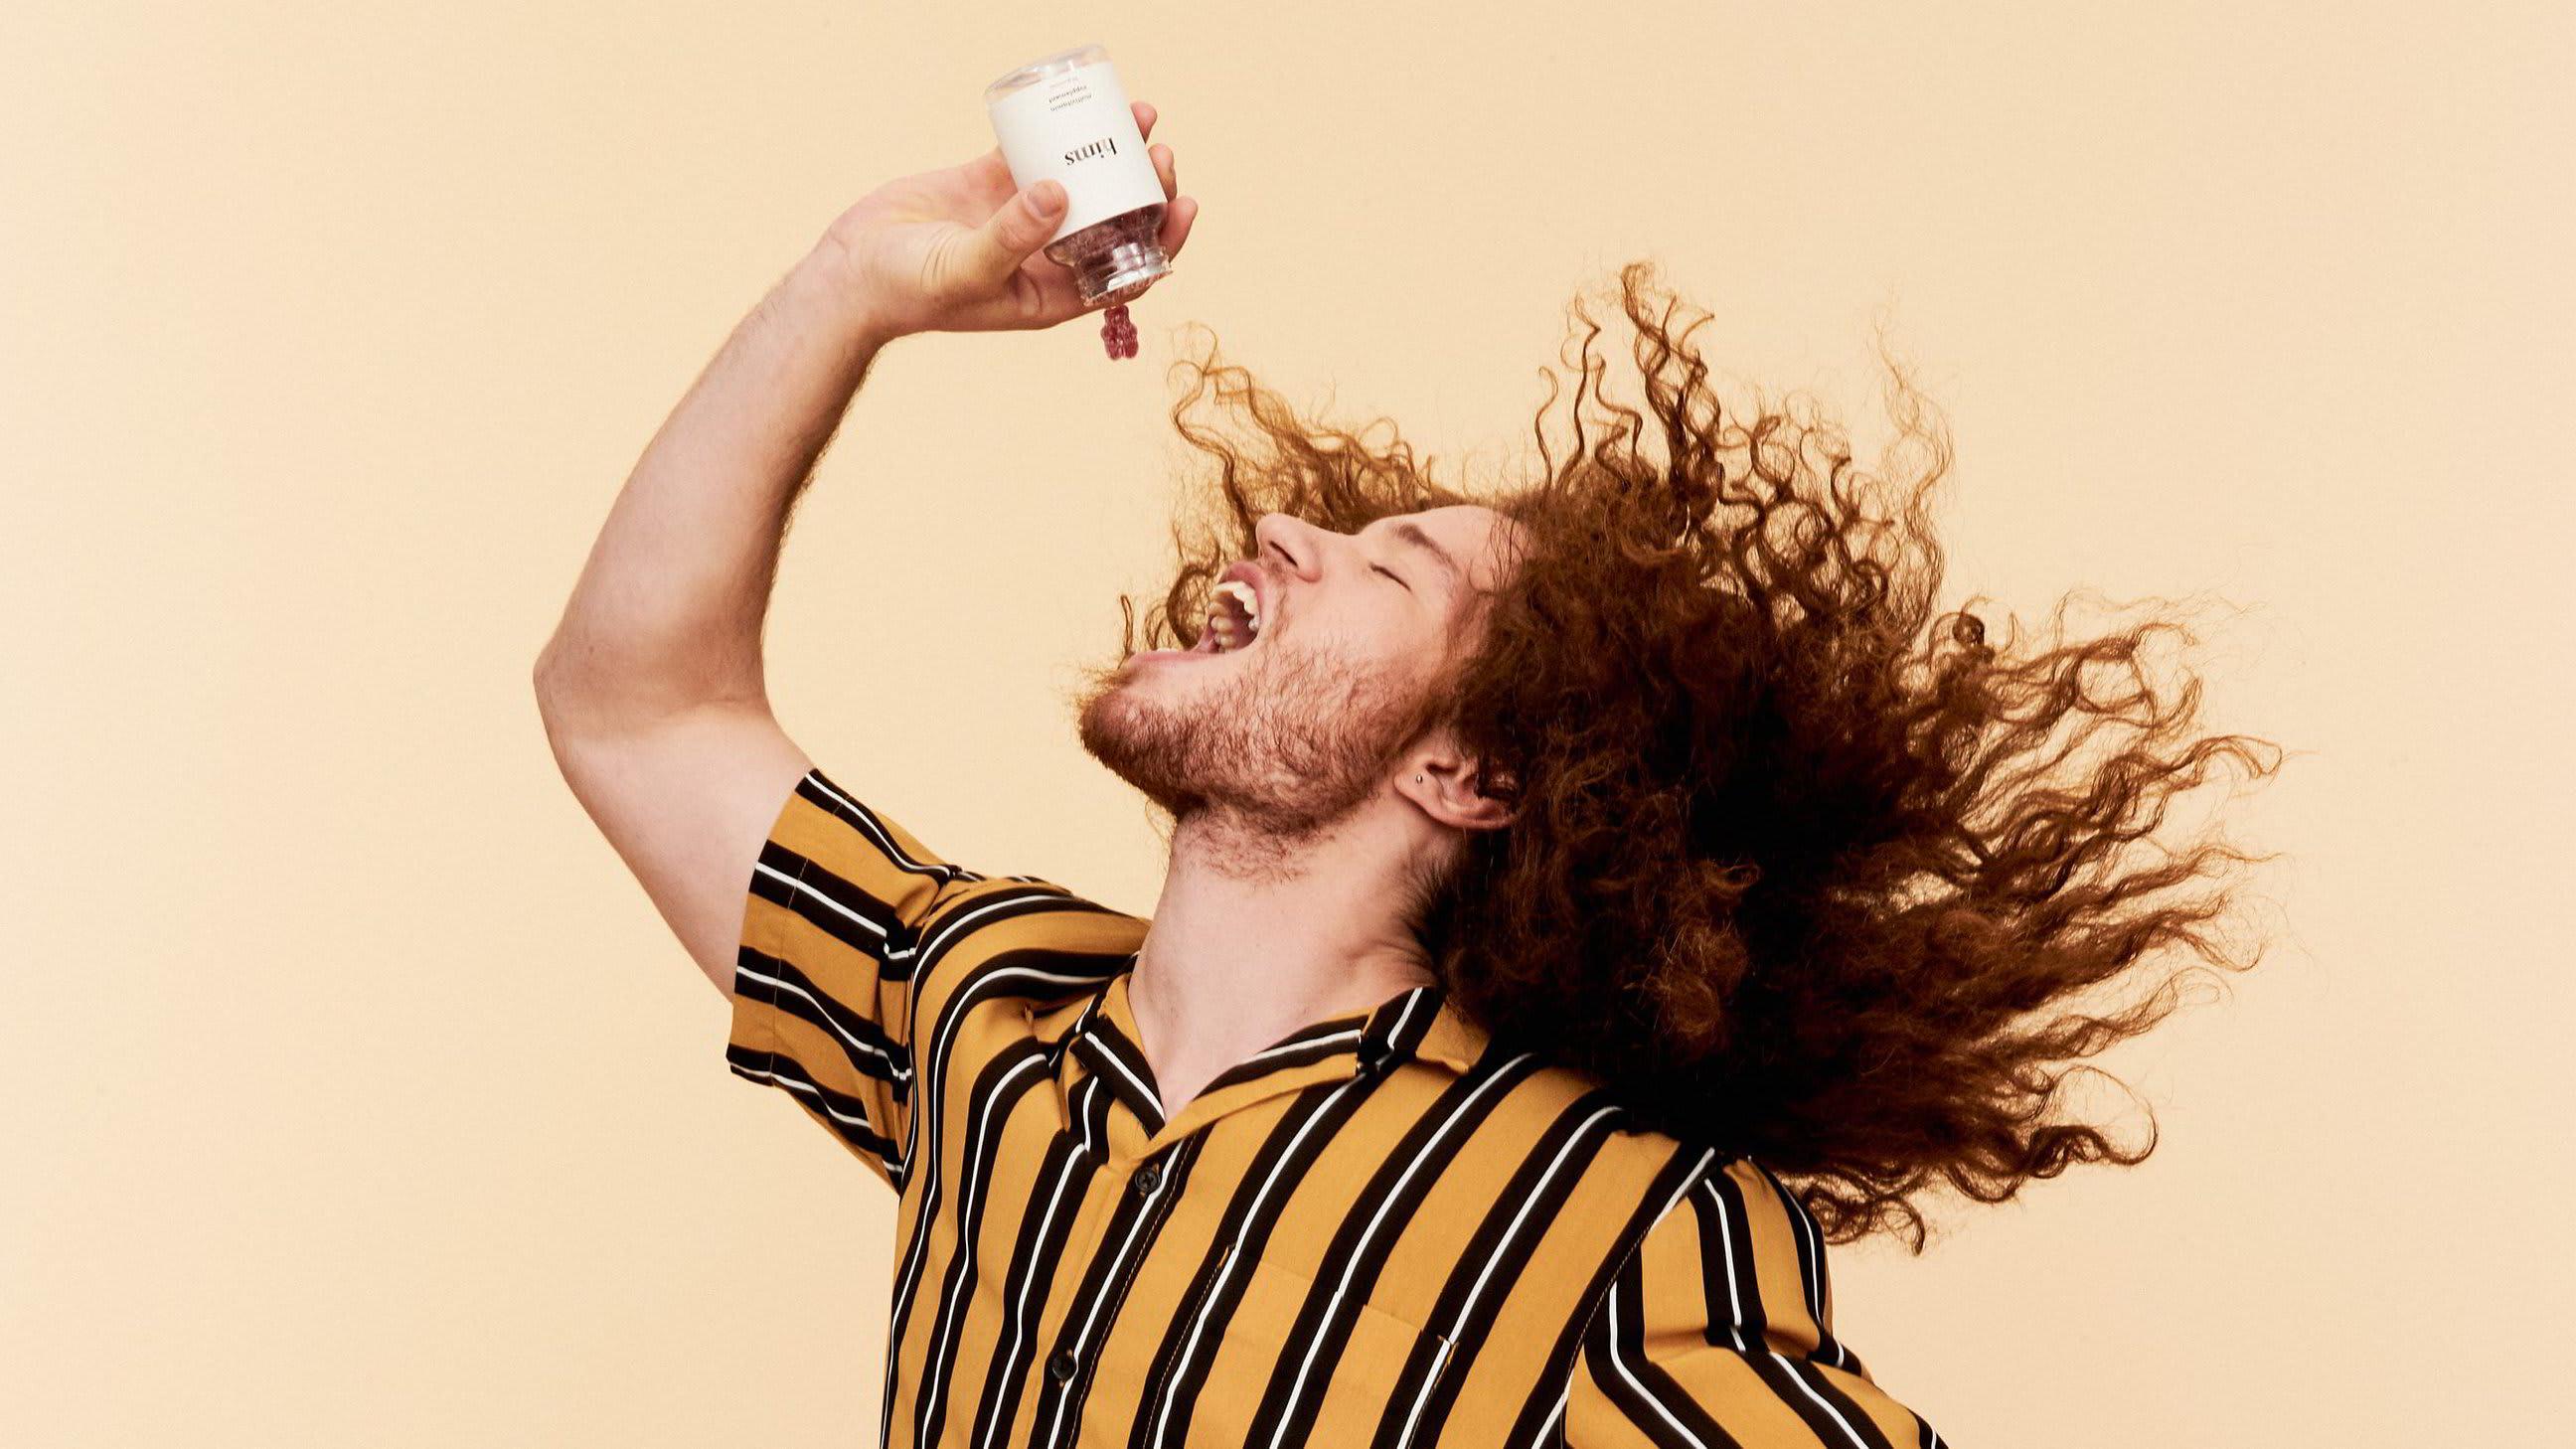 A young man with long hair dramatically eating a Hims Hair vitamin